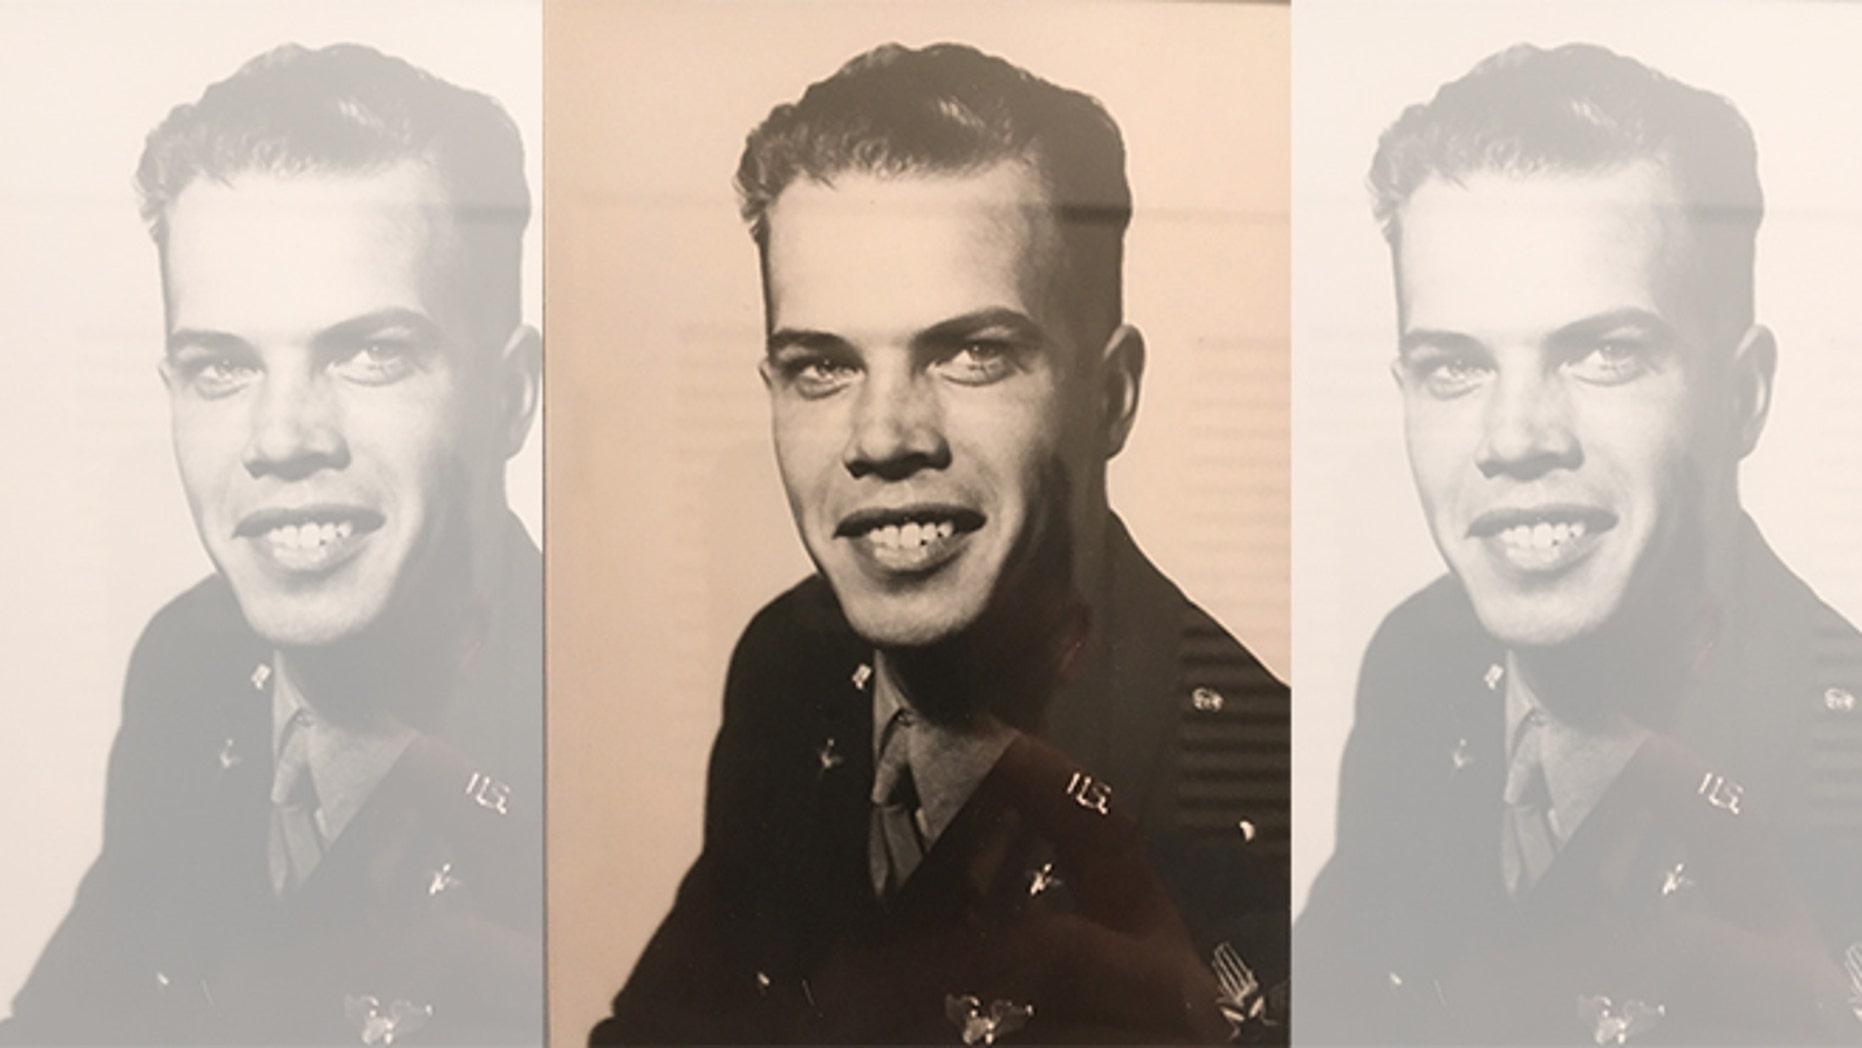 Army Air Forces 1st Lt. William J. Gray, Jr., 21, of Kirkland, Washington.